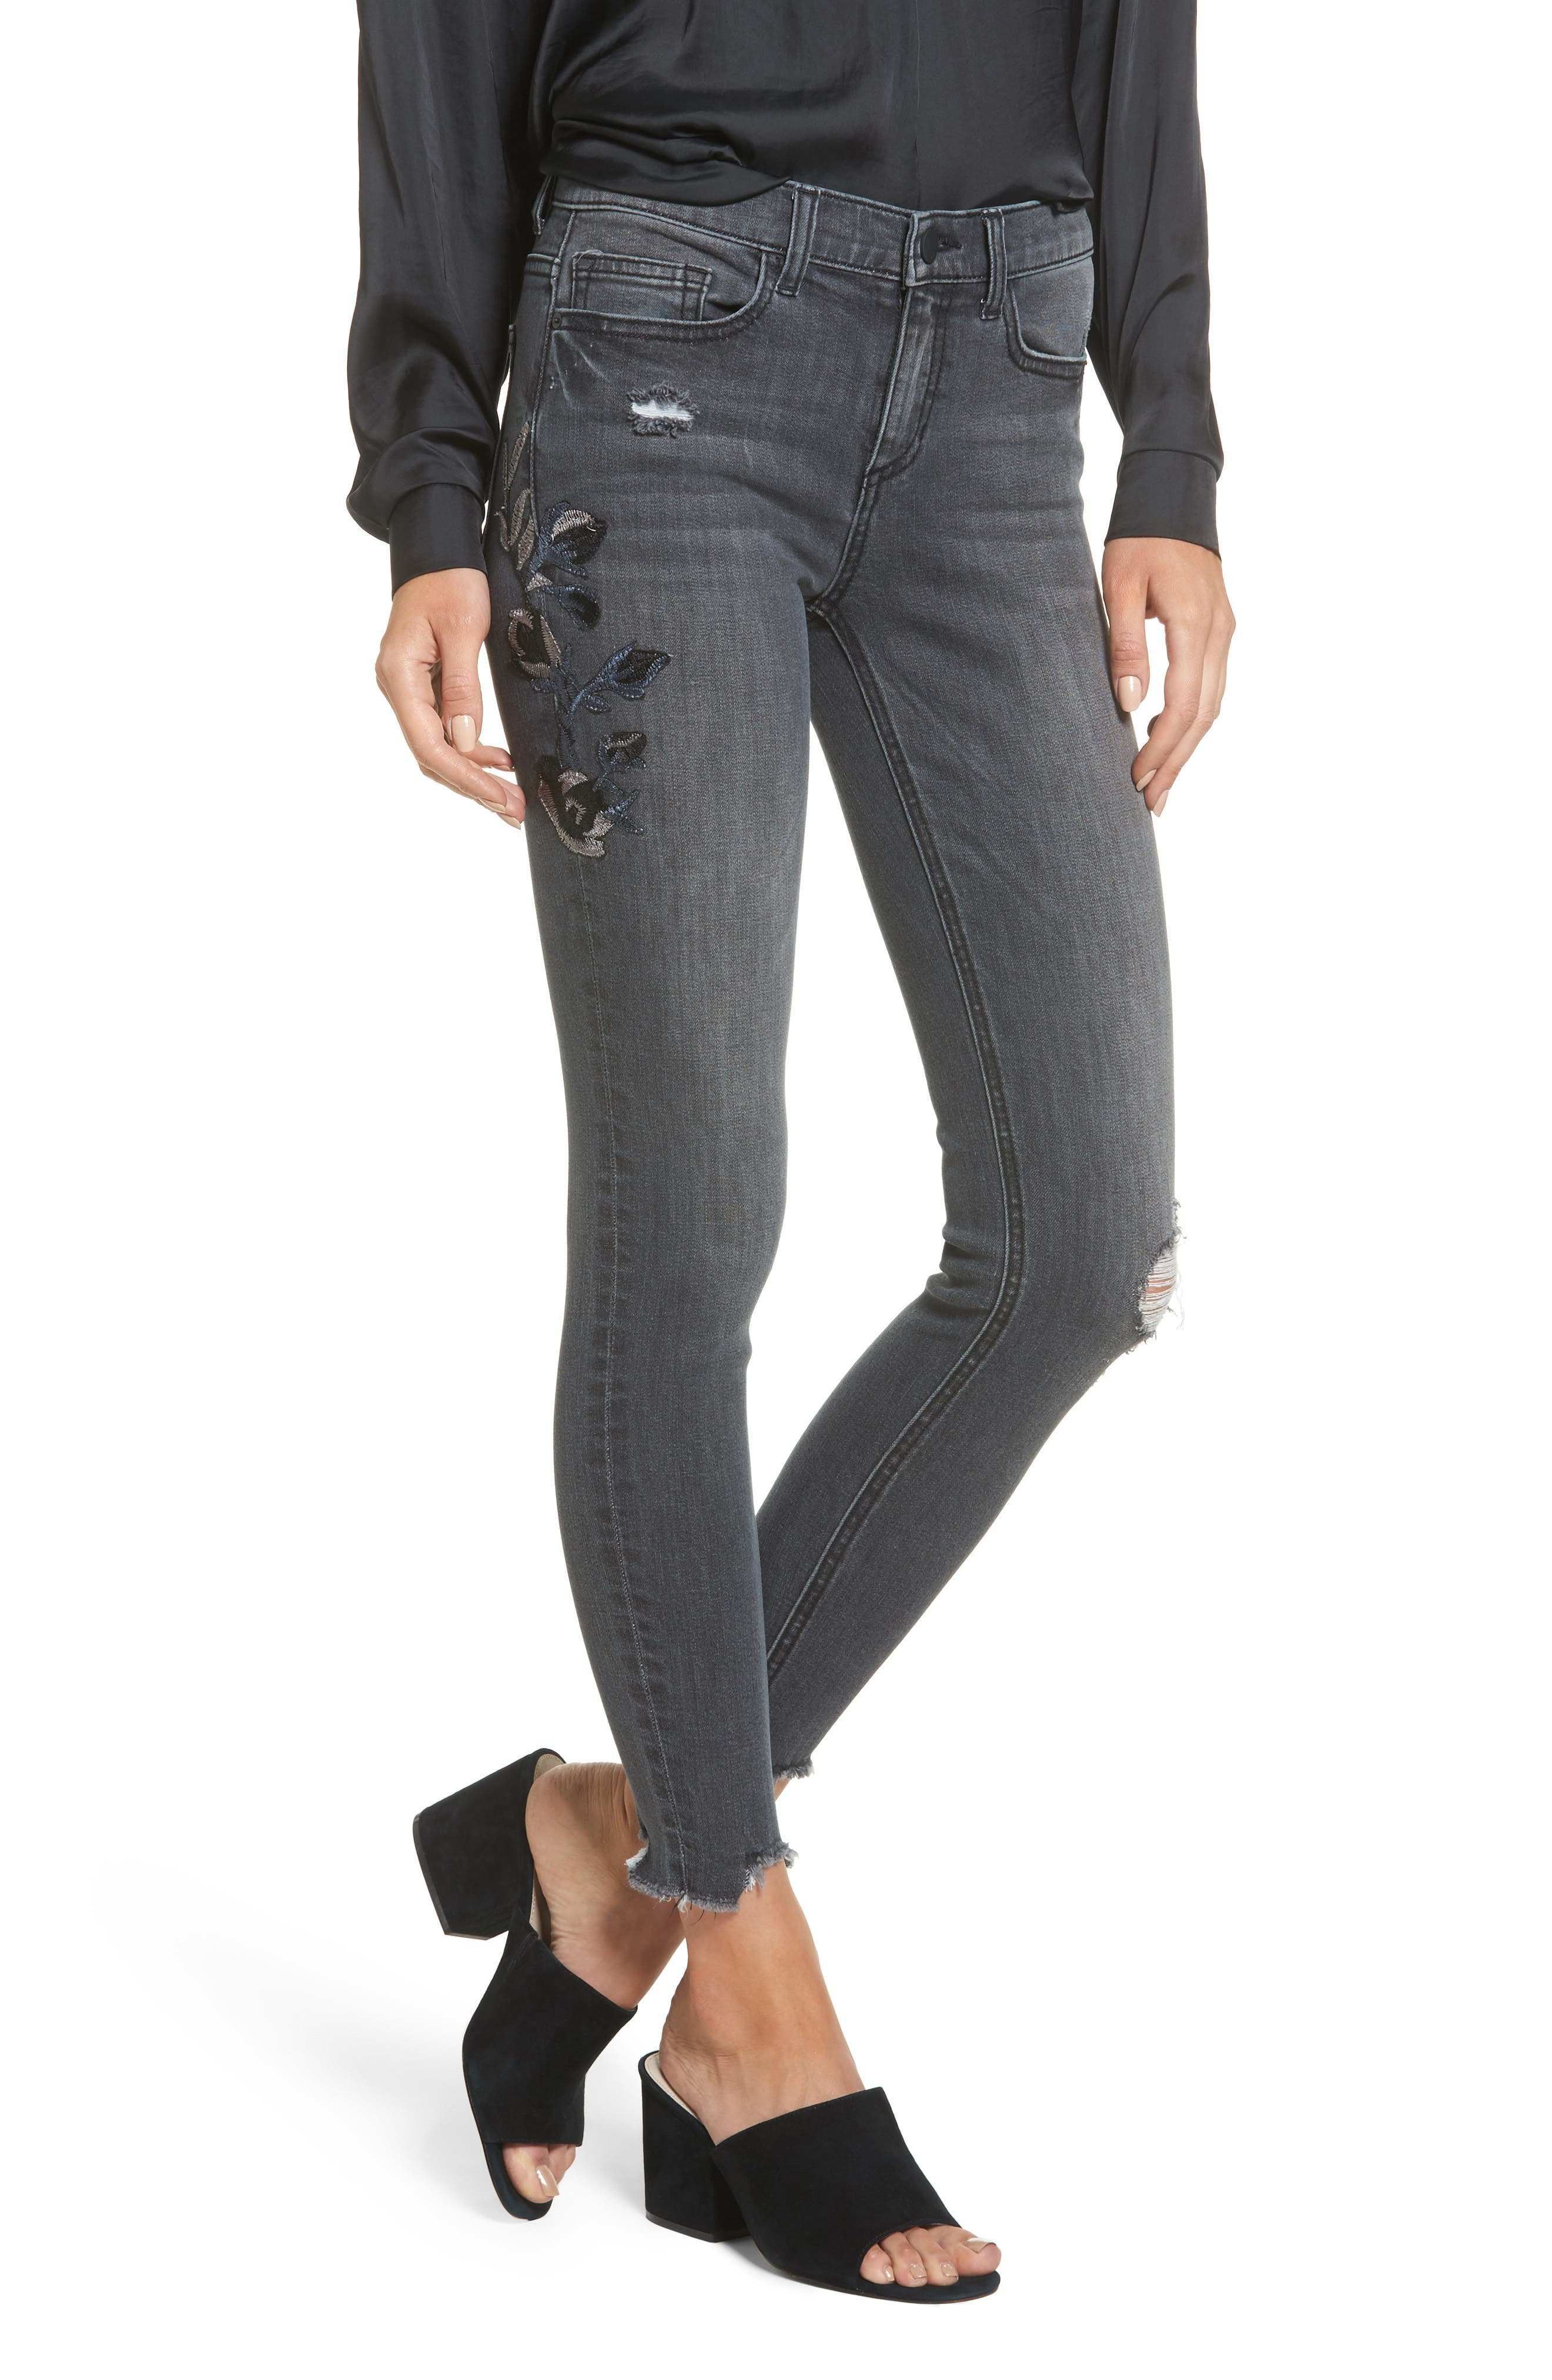 SP Black Embroidered Skinny Jeans